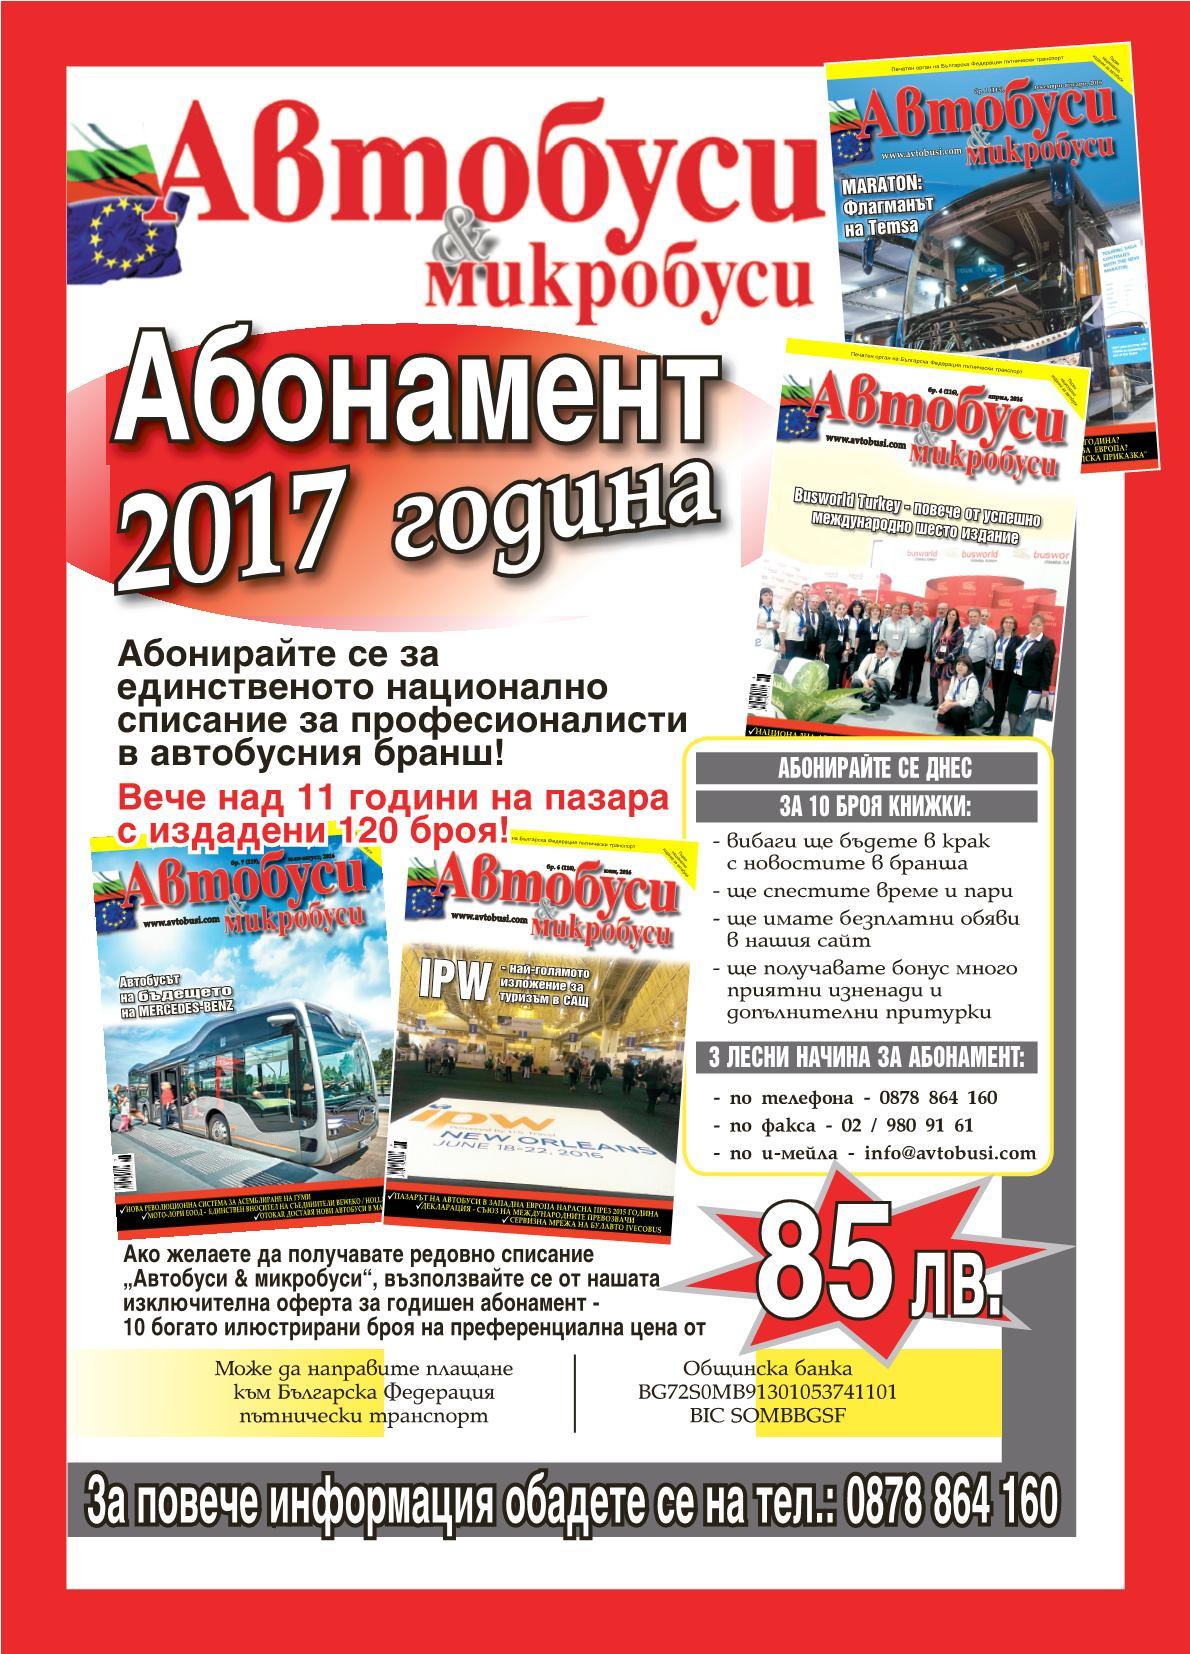 abonament-2017